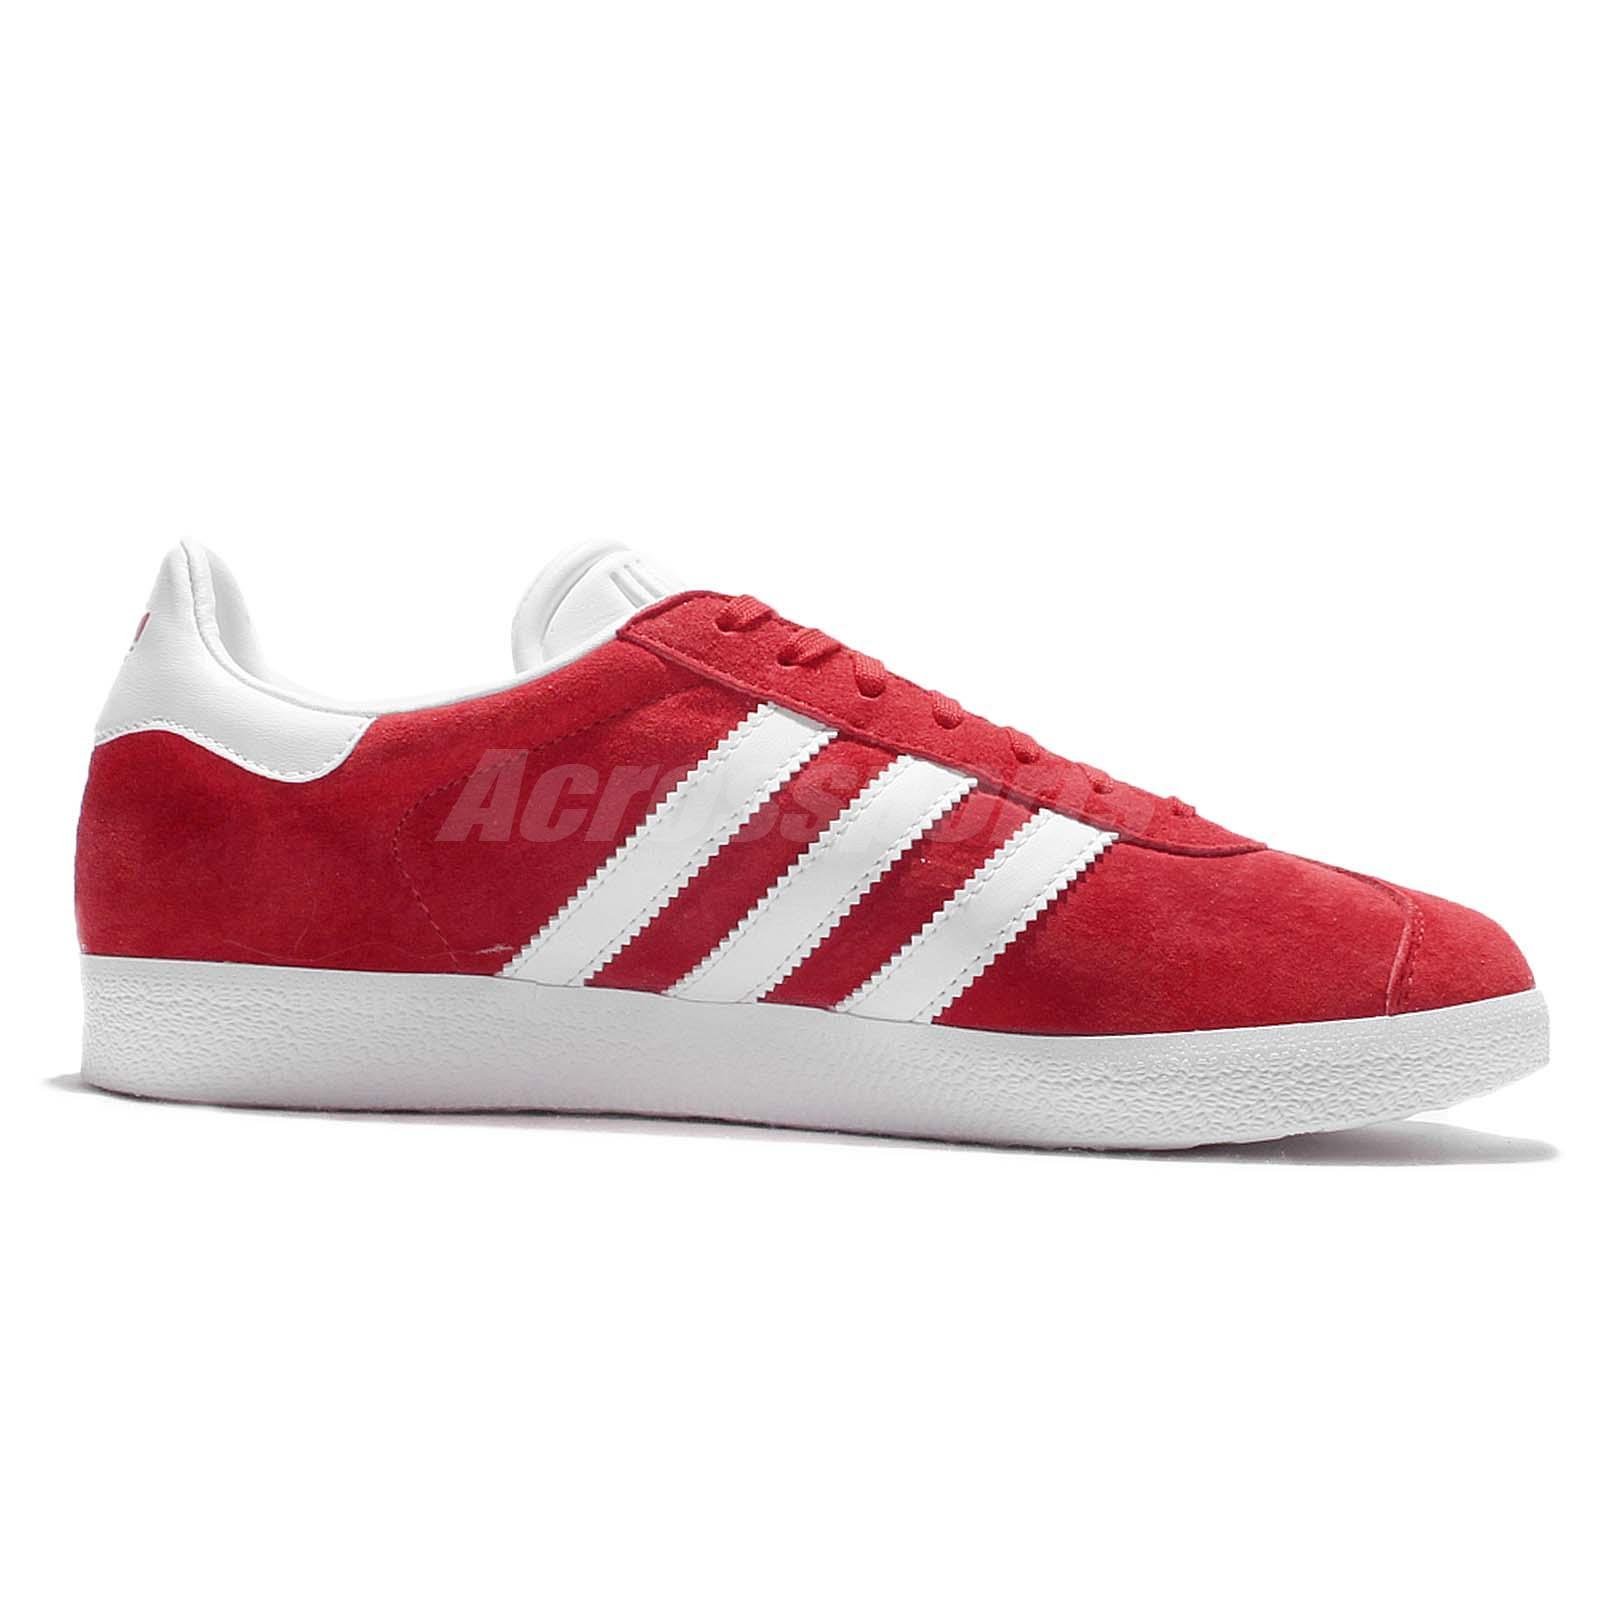 32a628d37ed adidas Originals Gazalle Red White Mens Vintage Shoes Classic ...